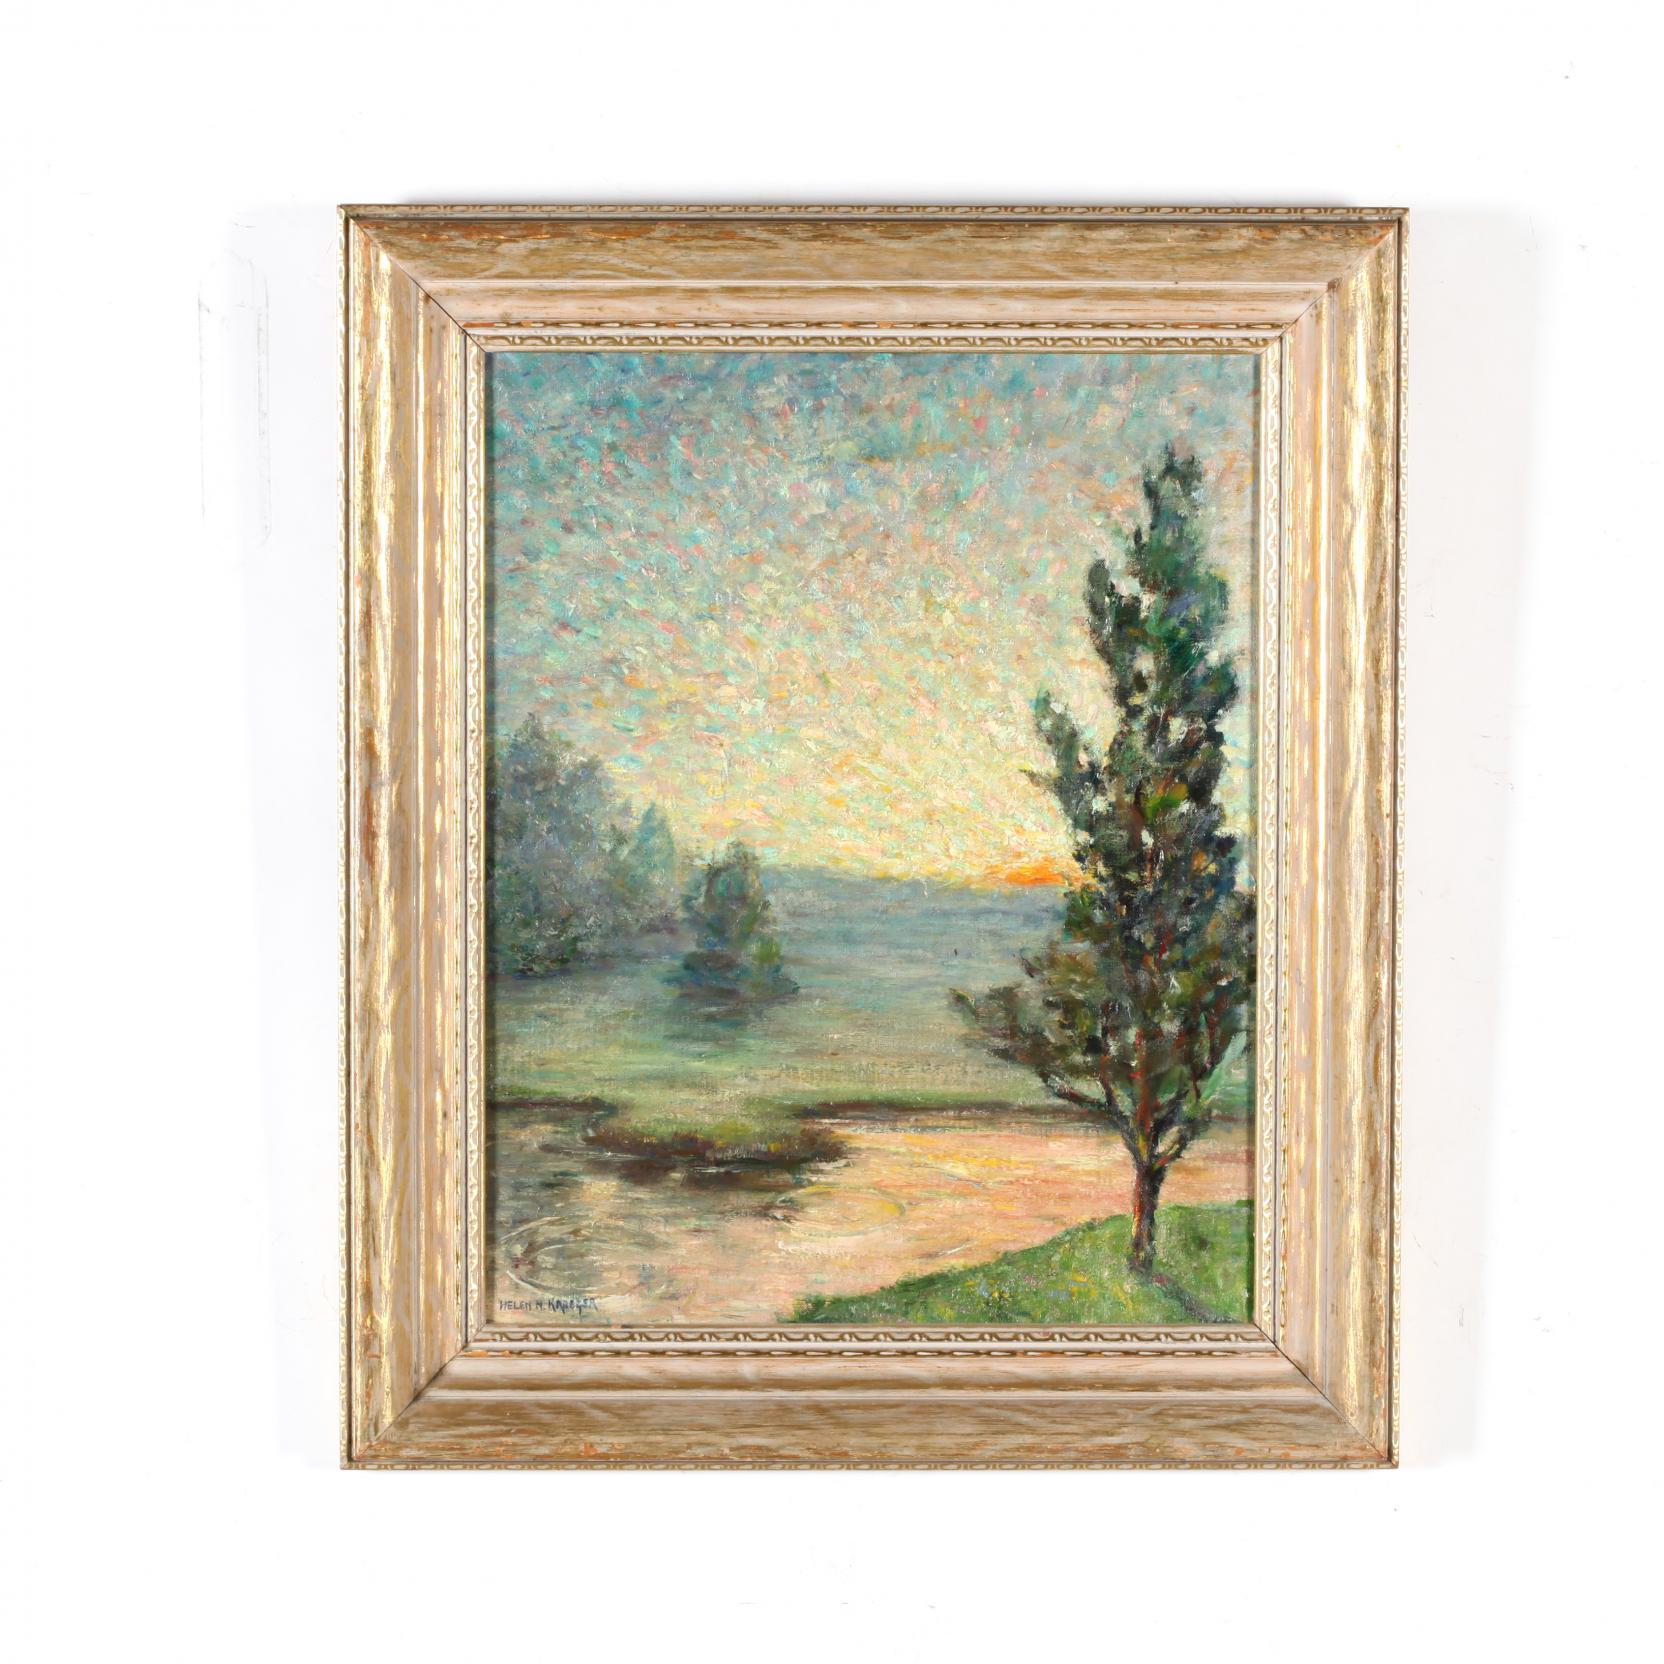 helen-kroeger-ny-1892-1986-i-sunrise-i